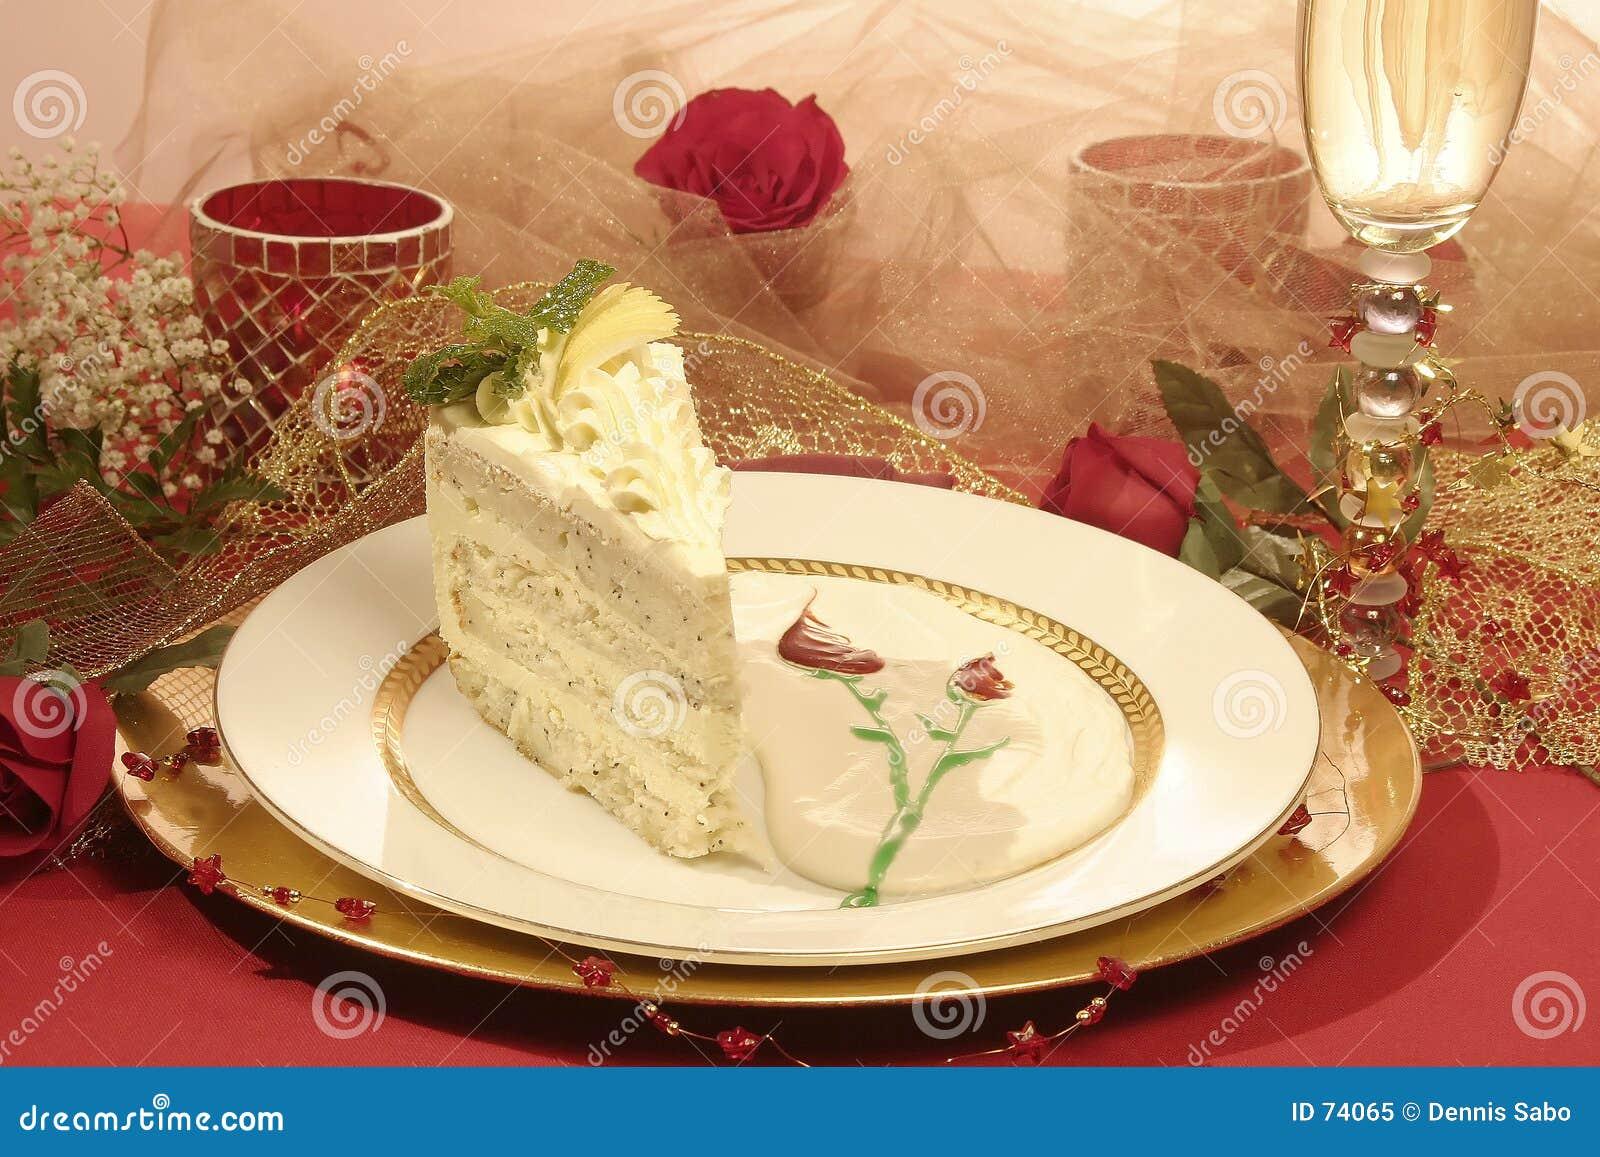 Sensual lemon Poppy Cake